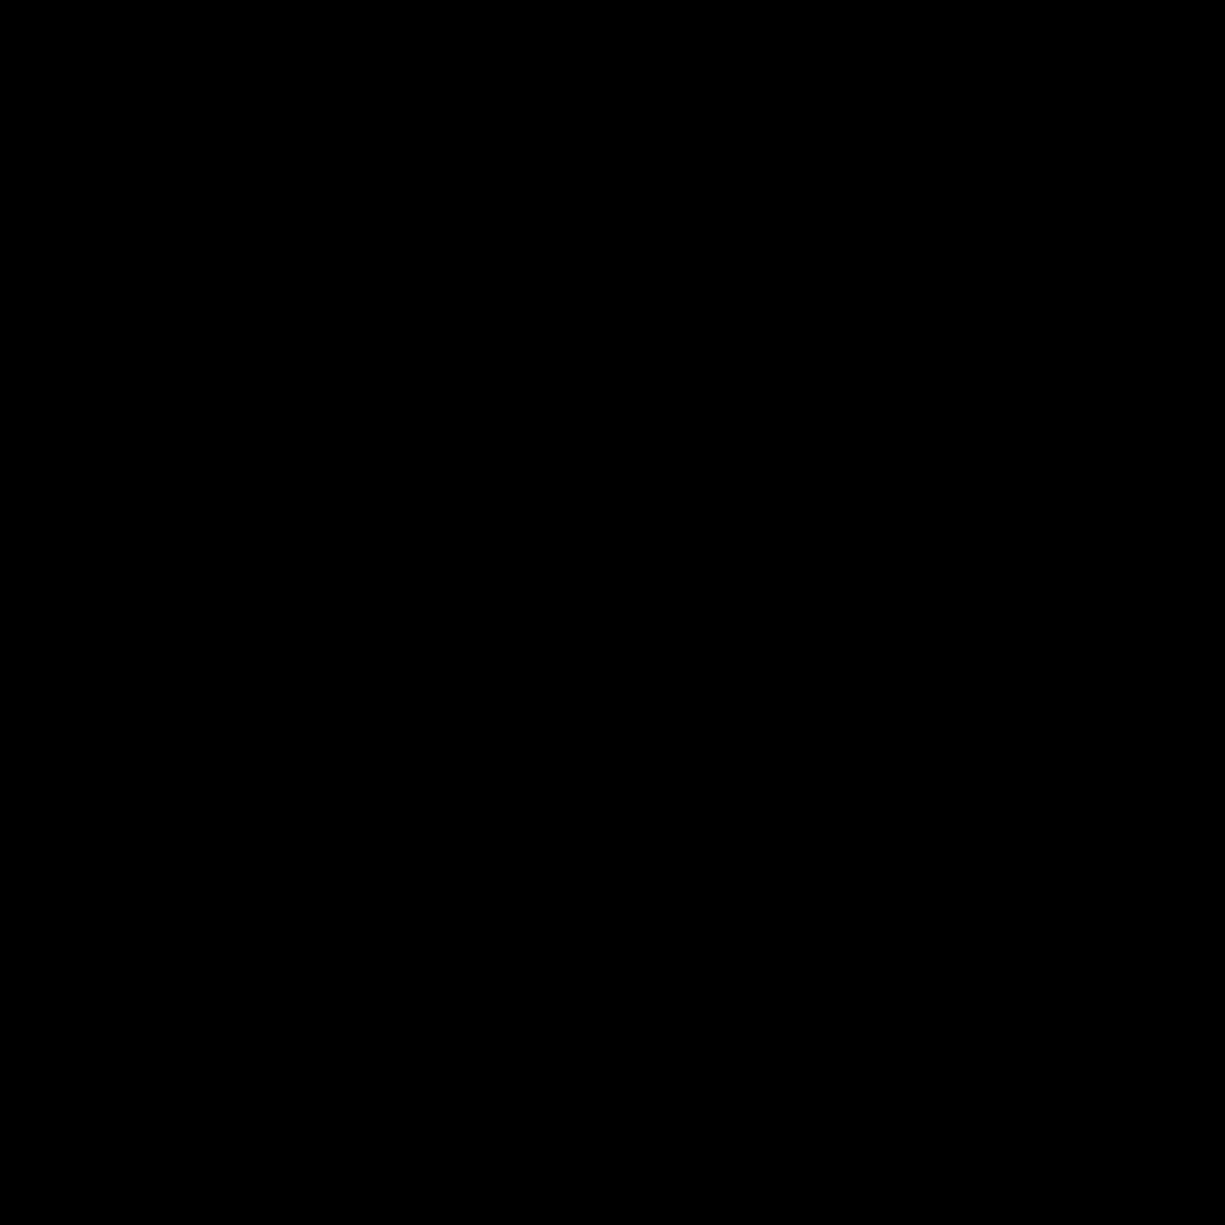 file1-11